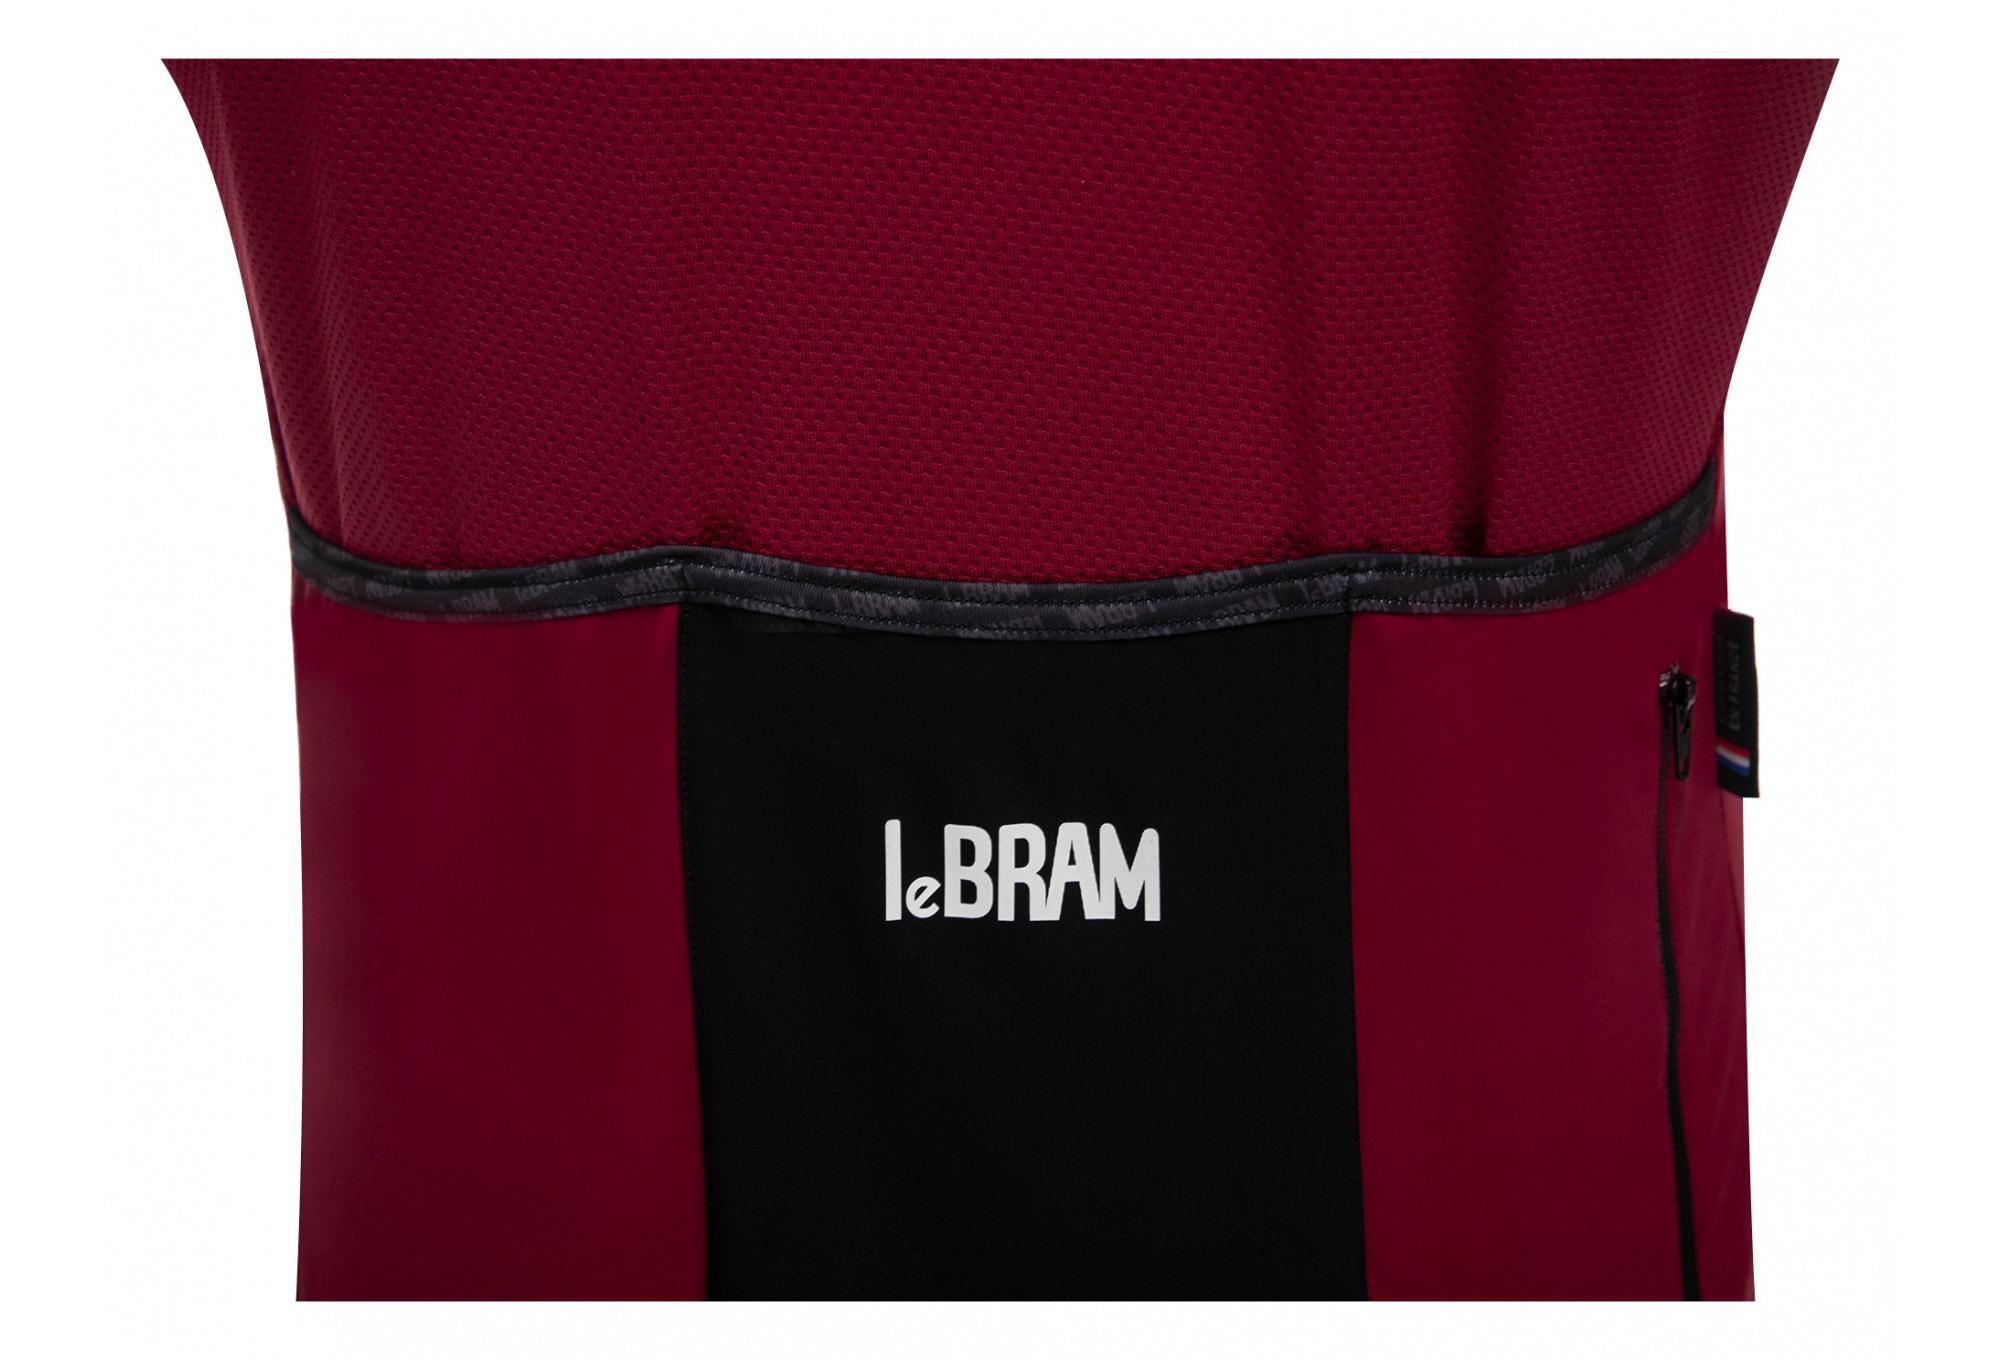 202007_LEBRAM_ALLOS_BORDEAUX_5